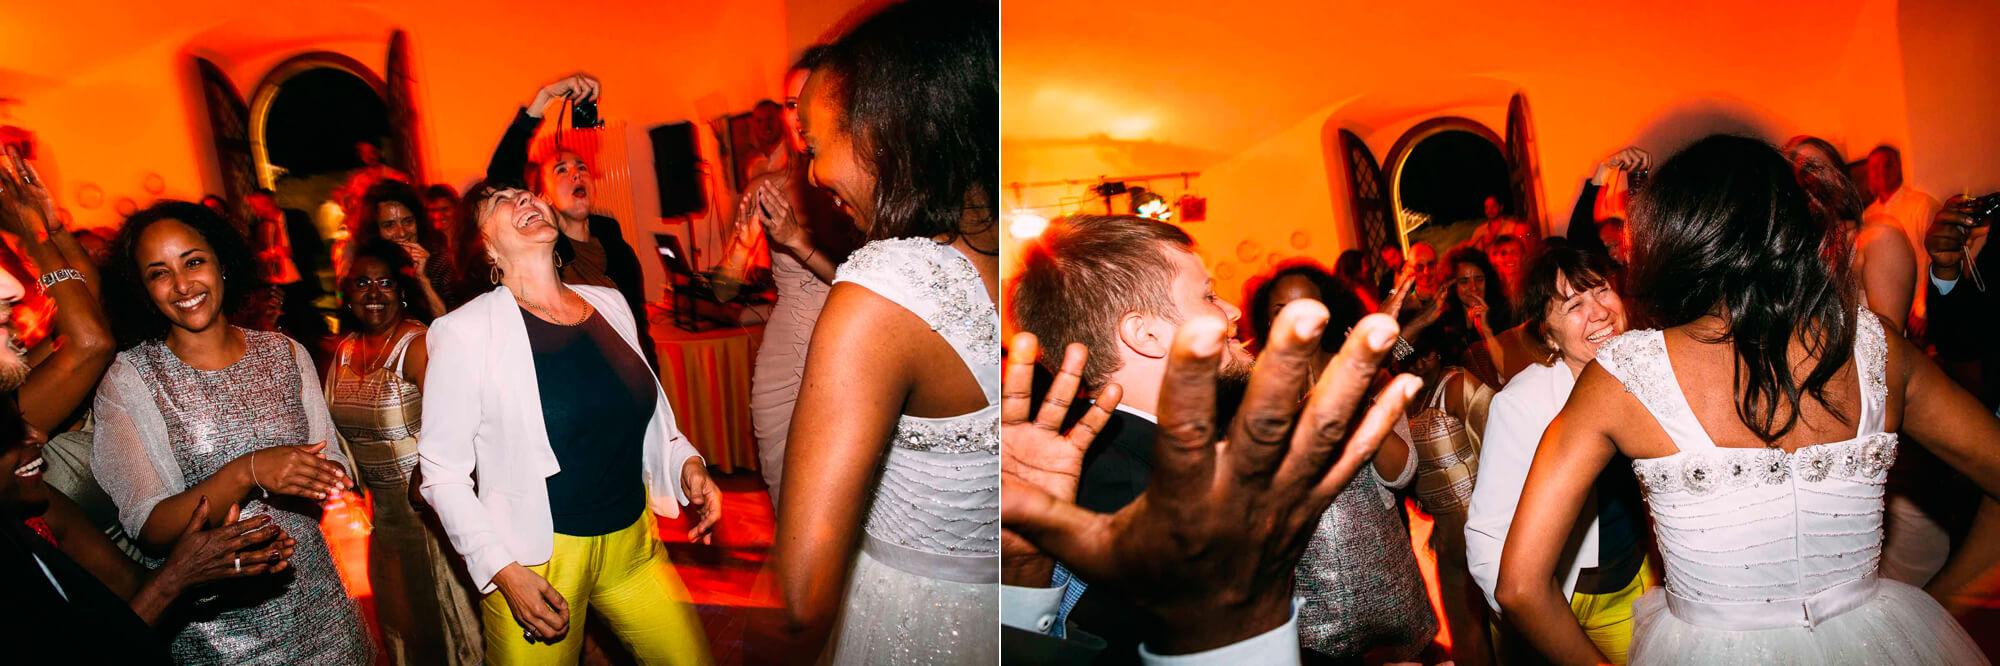 163-sorrento-wedding-photographer.jpg